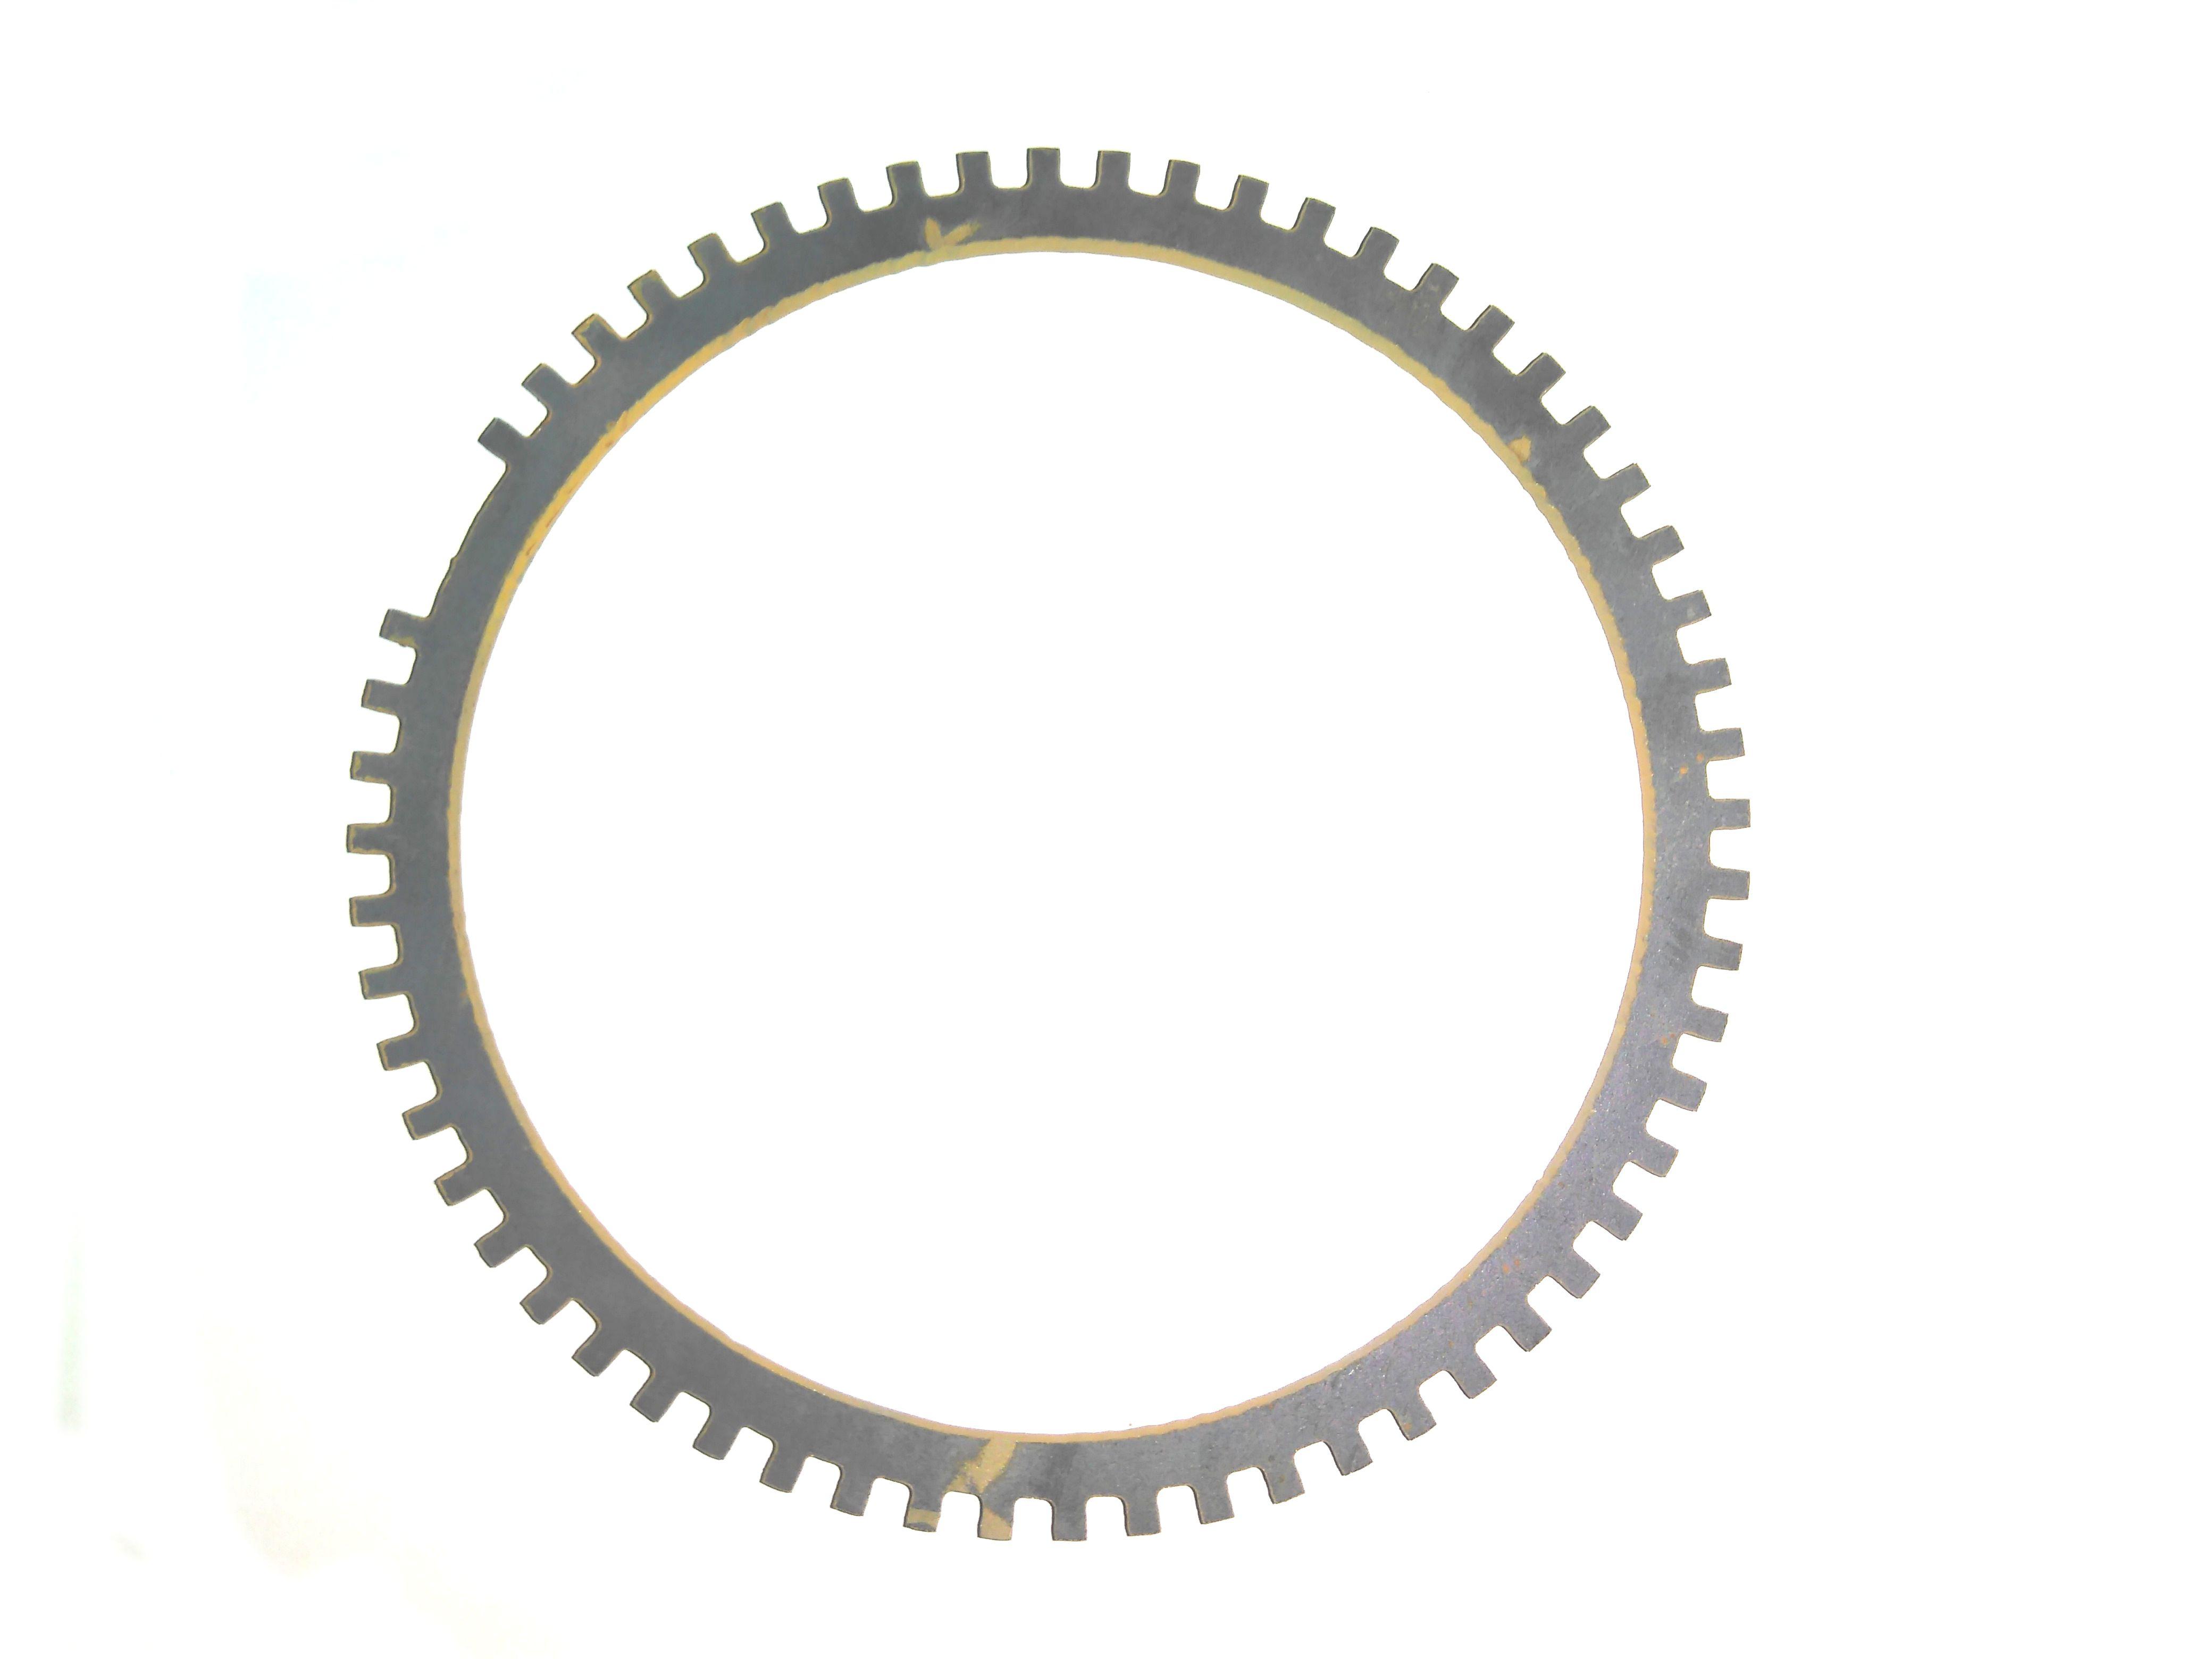 Trigger wheel 60-2, P&L Racing